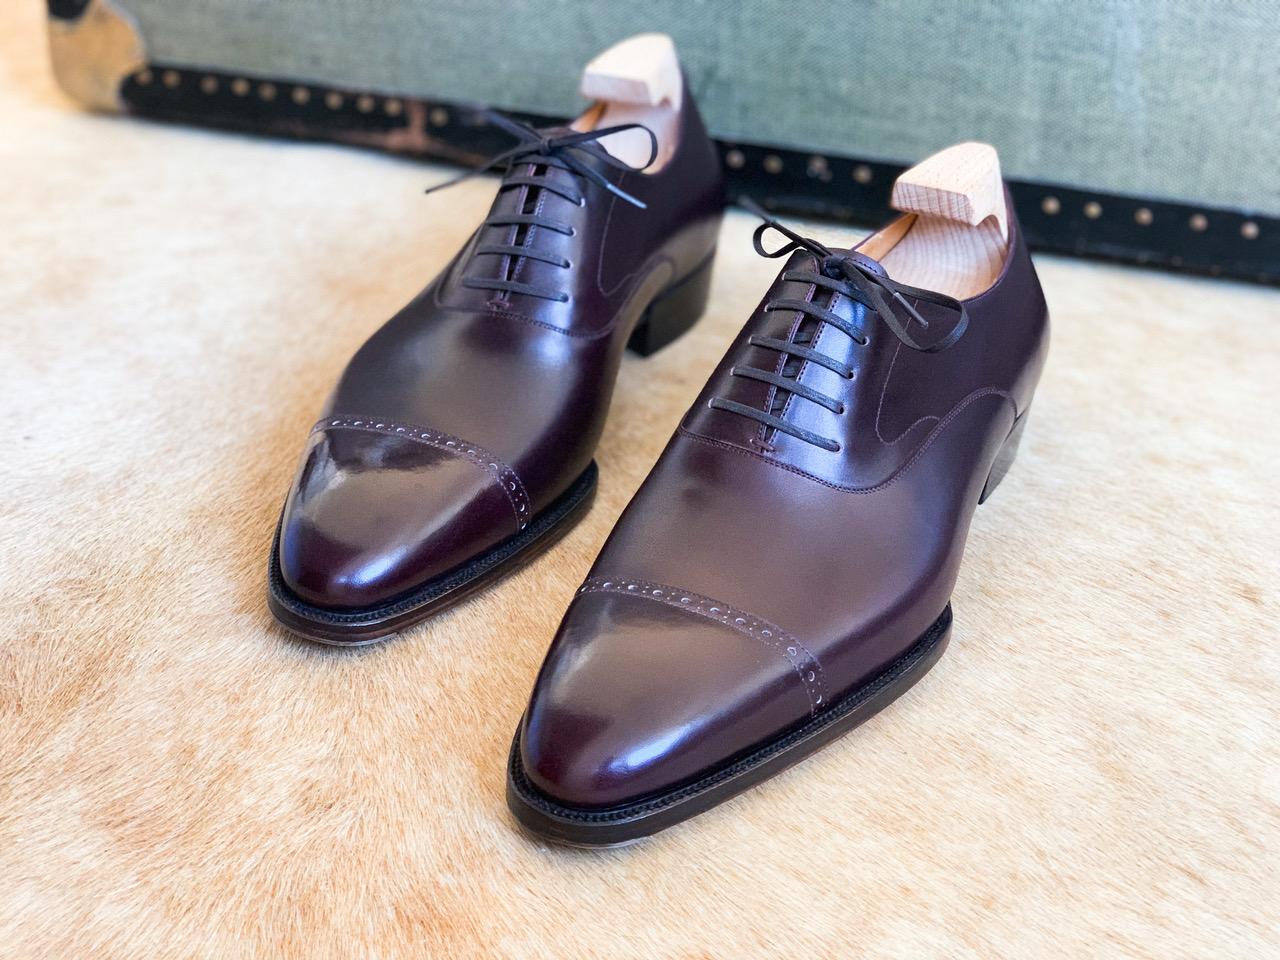 Wayman Bespoke Quality Shoes